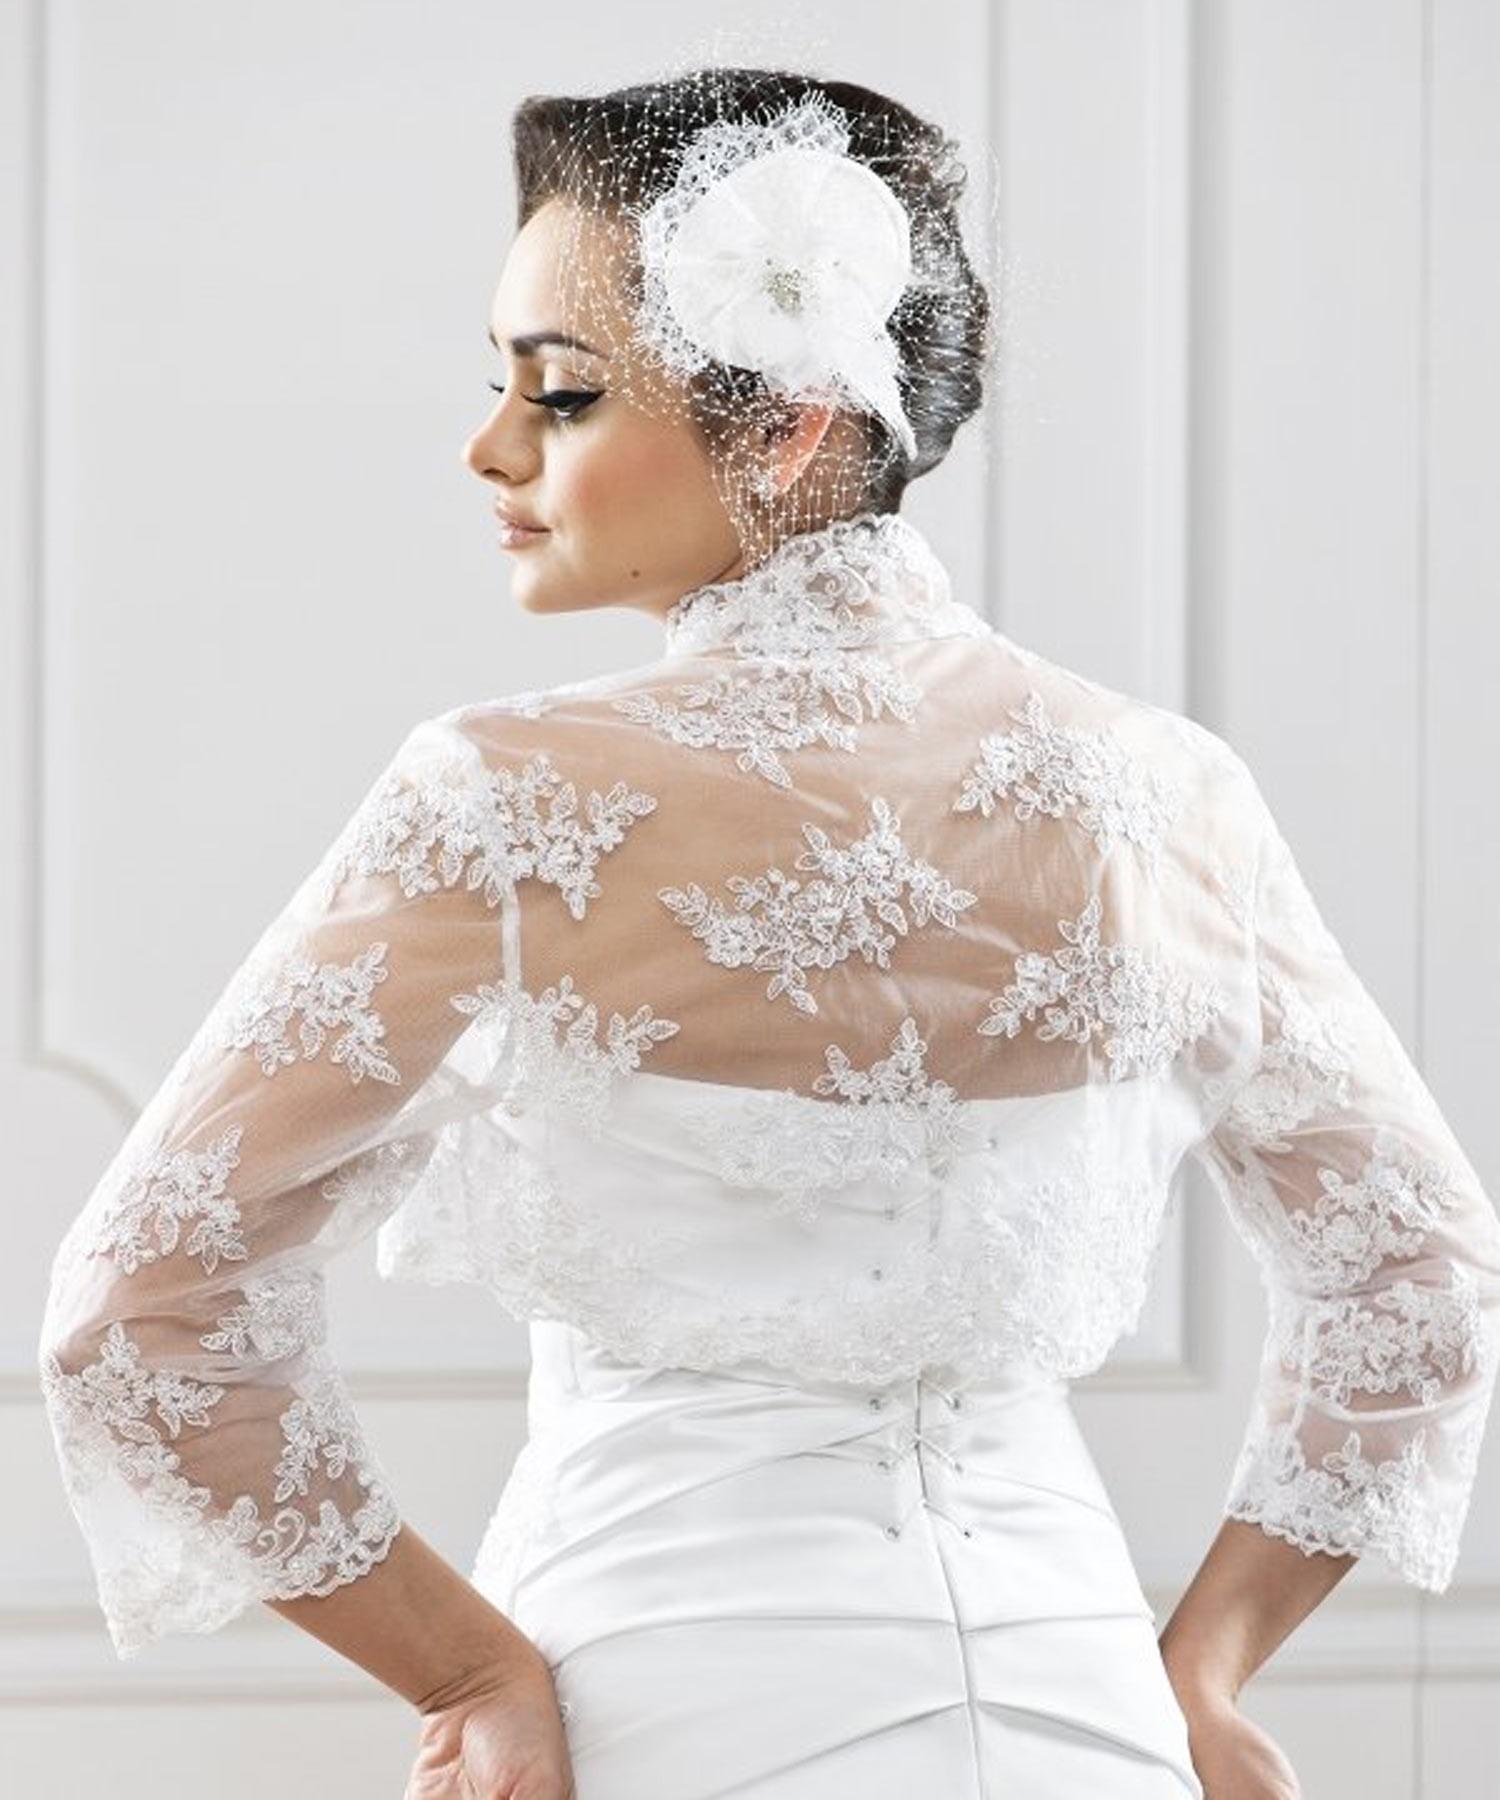 bolro marie dentelle vanou blanc - Bolero Mariage Blanc